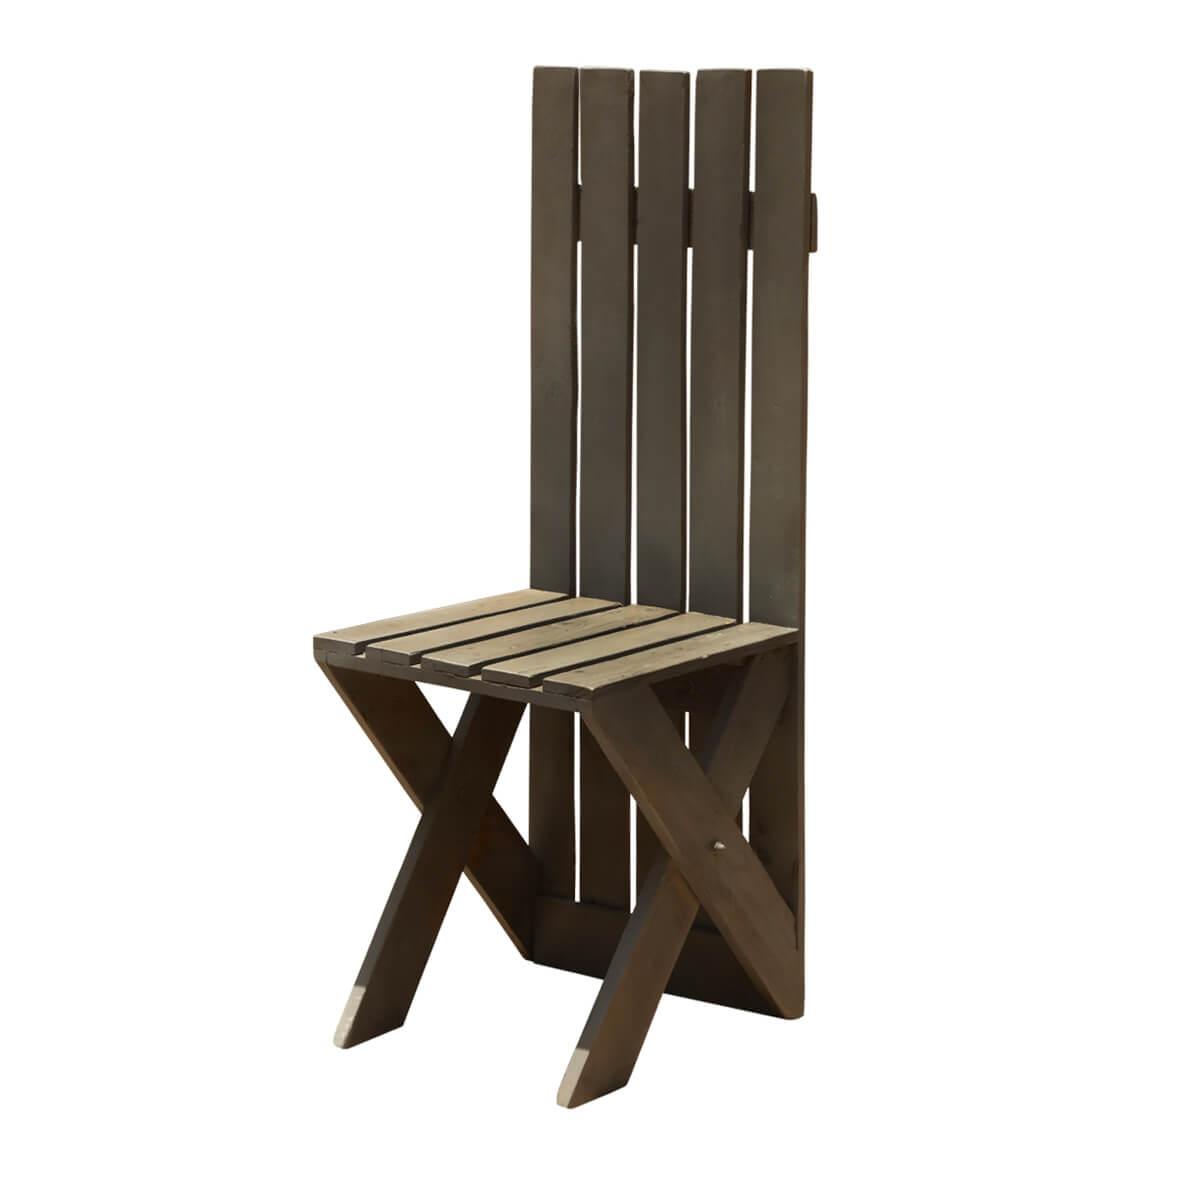 Magnificent Modern Pioneer Handmade Tall Back Patio Chair Download Free Architecture Designs Intelgarnamadebymaigaardcom